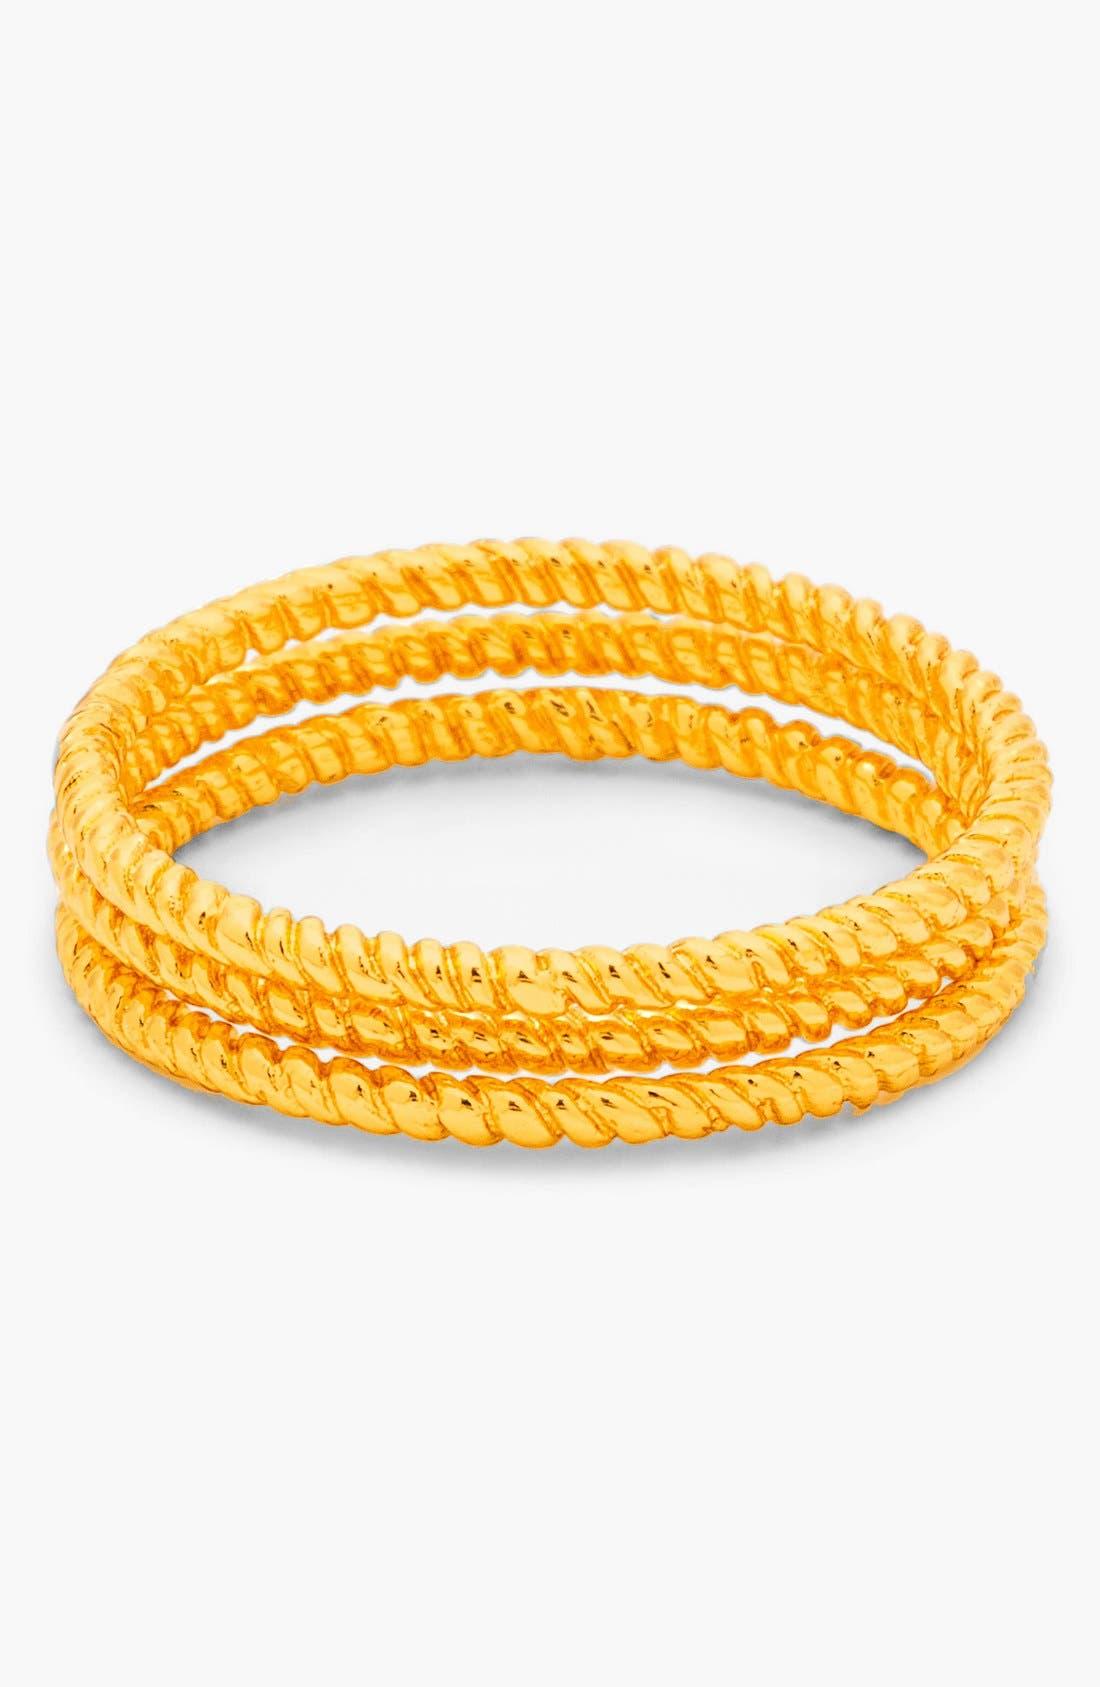 Main Image - gorjana Textured Rings (Set of 3)